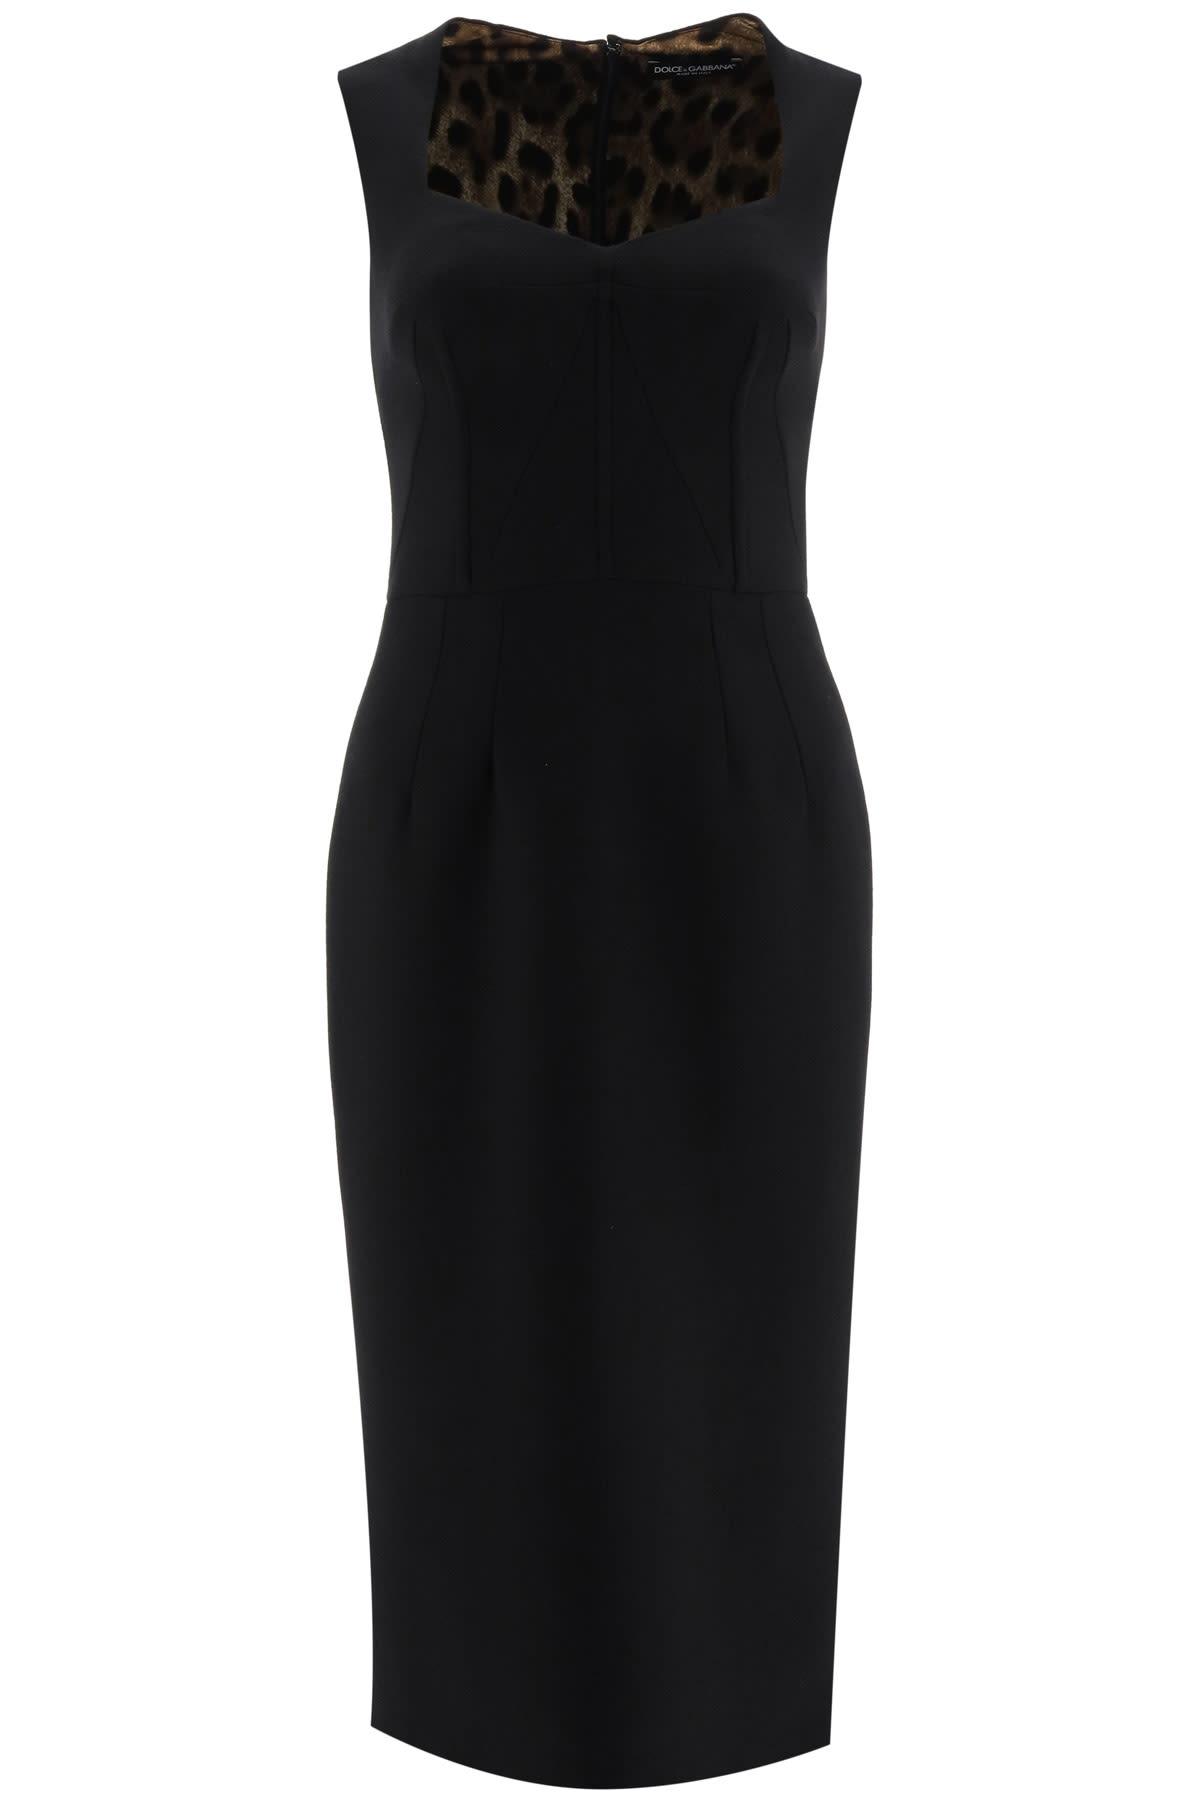 Dolce & Gabbana Midi Pencil Dress